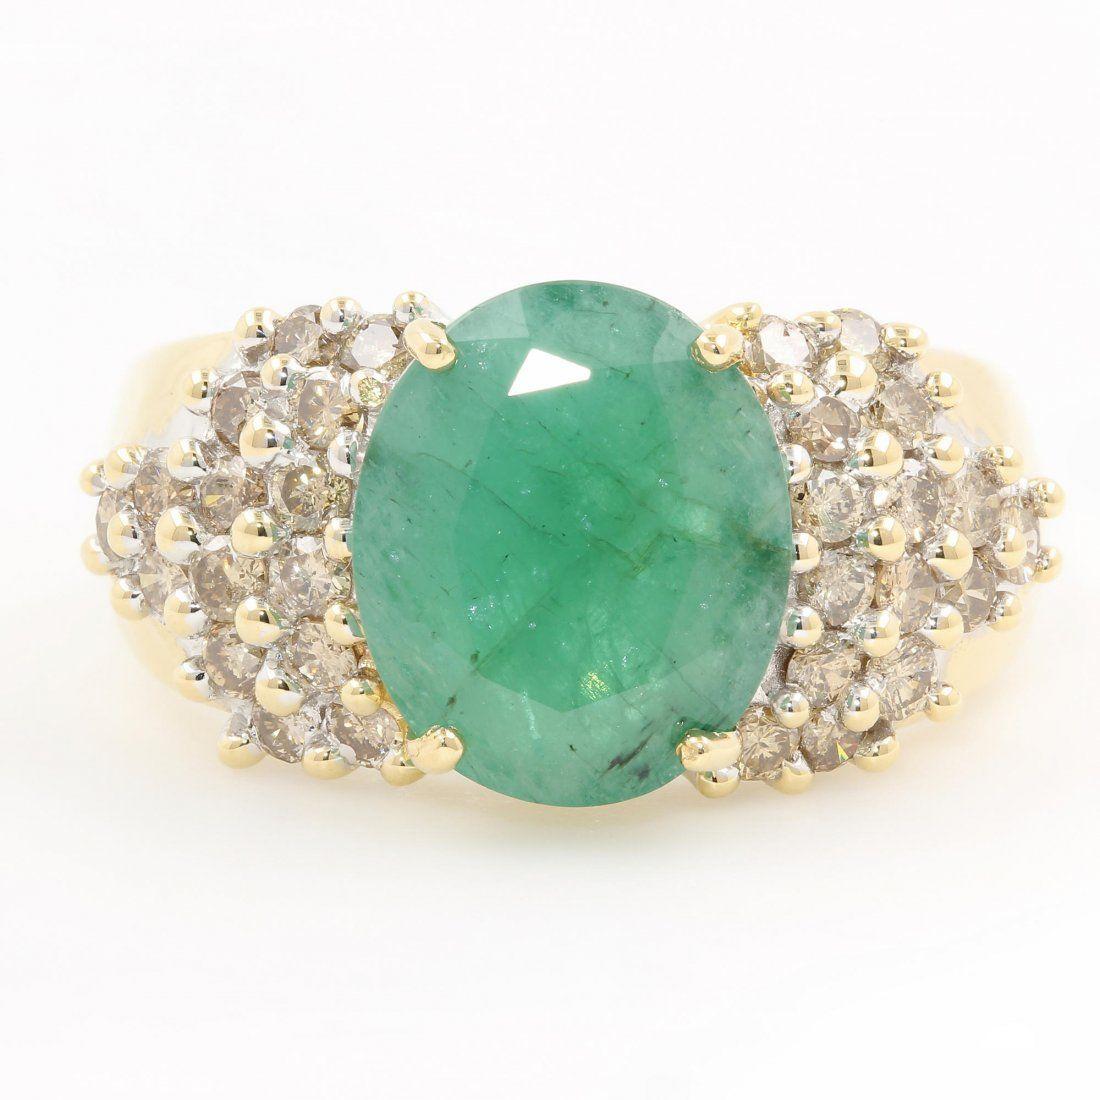 Vintage Estate Ladies 14K Yellow Gold Diamond Emerald